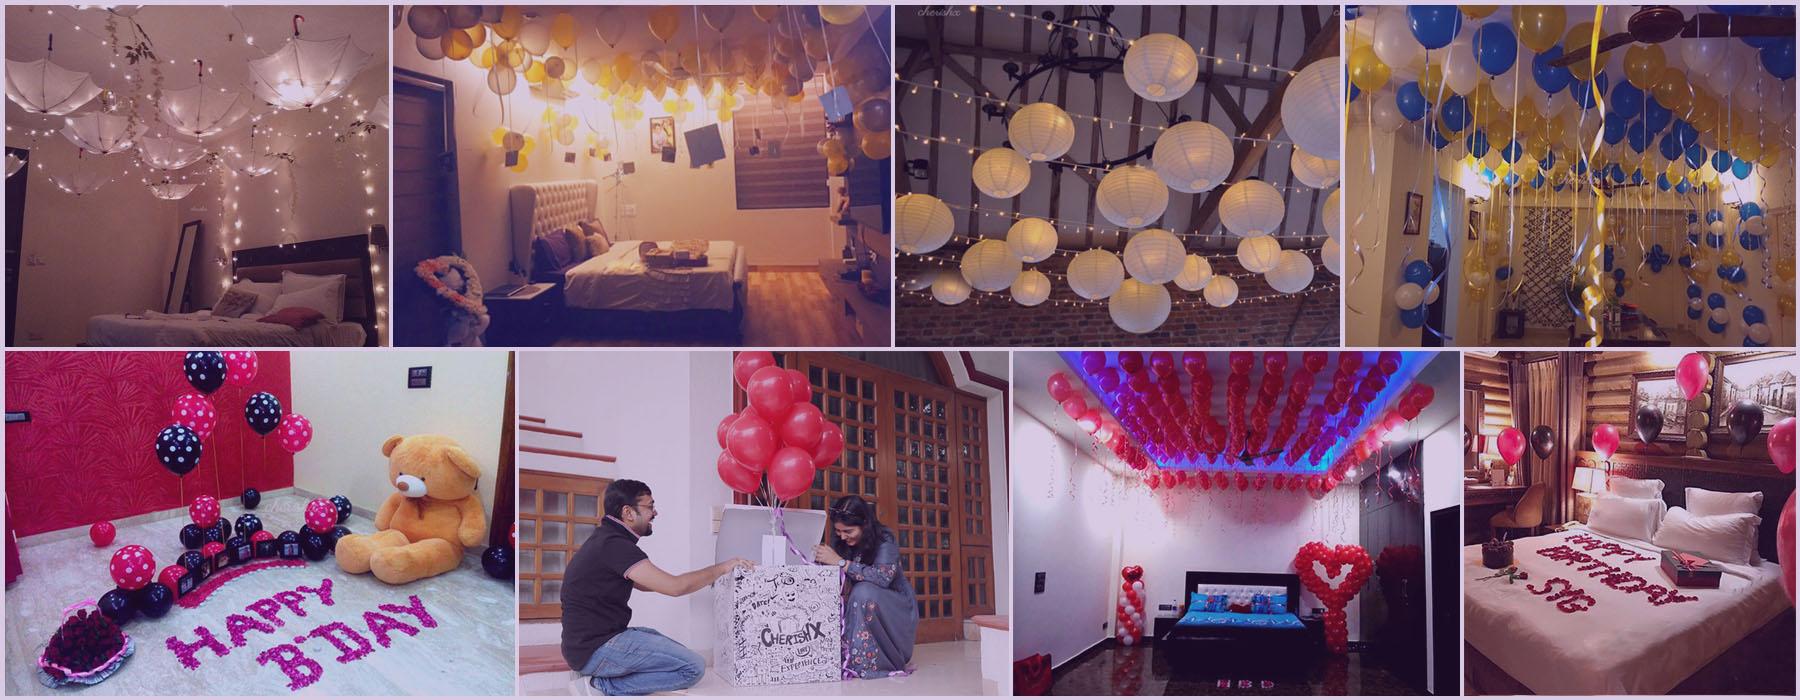 Balloon Decorations Birthday Decoration Services In Kolkata